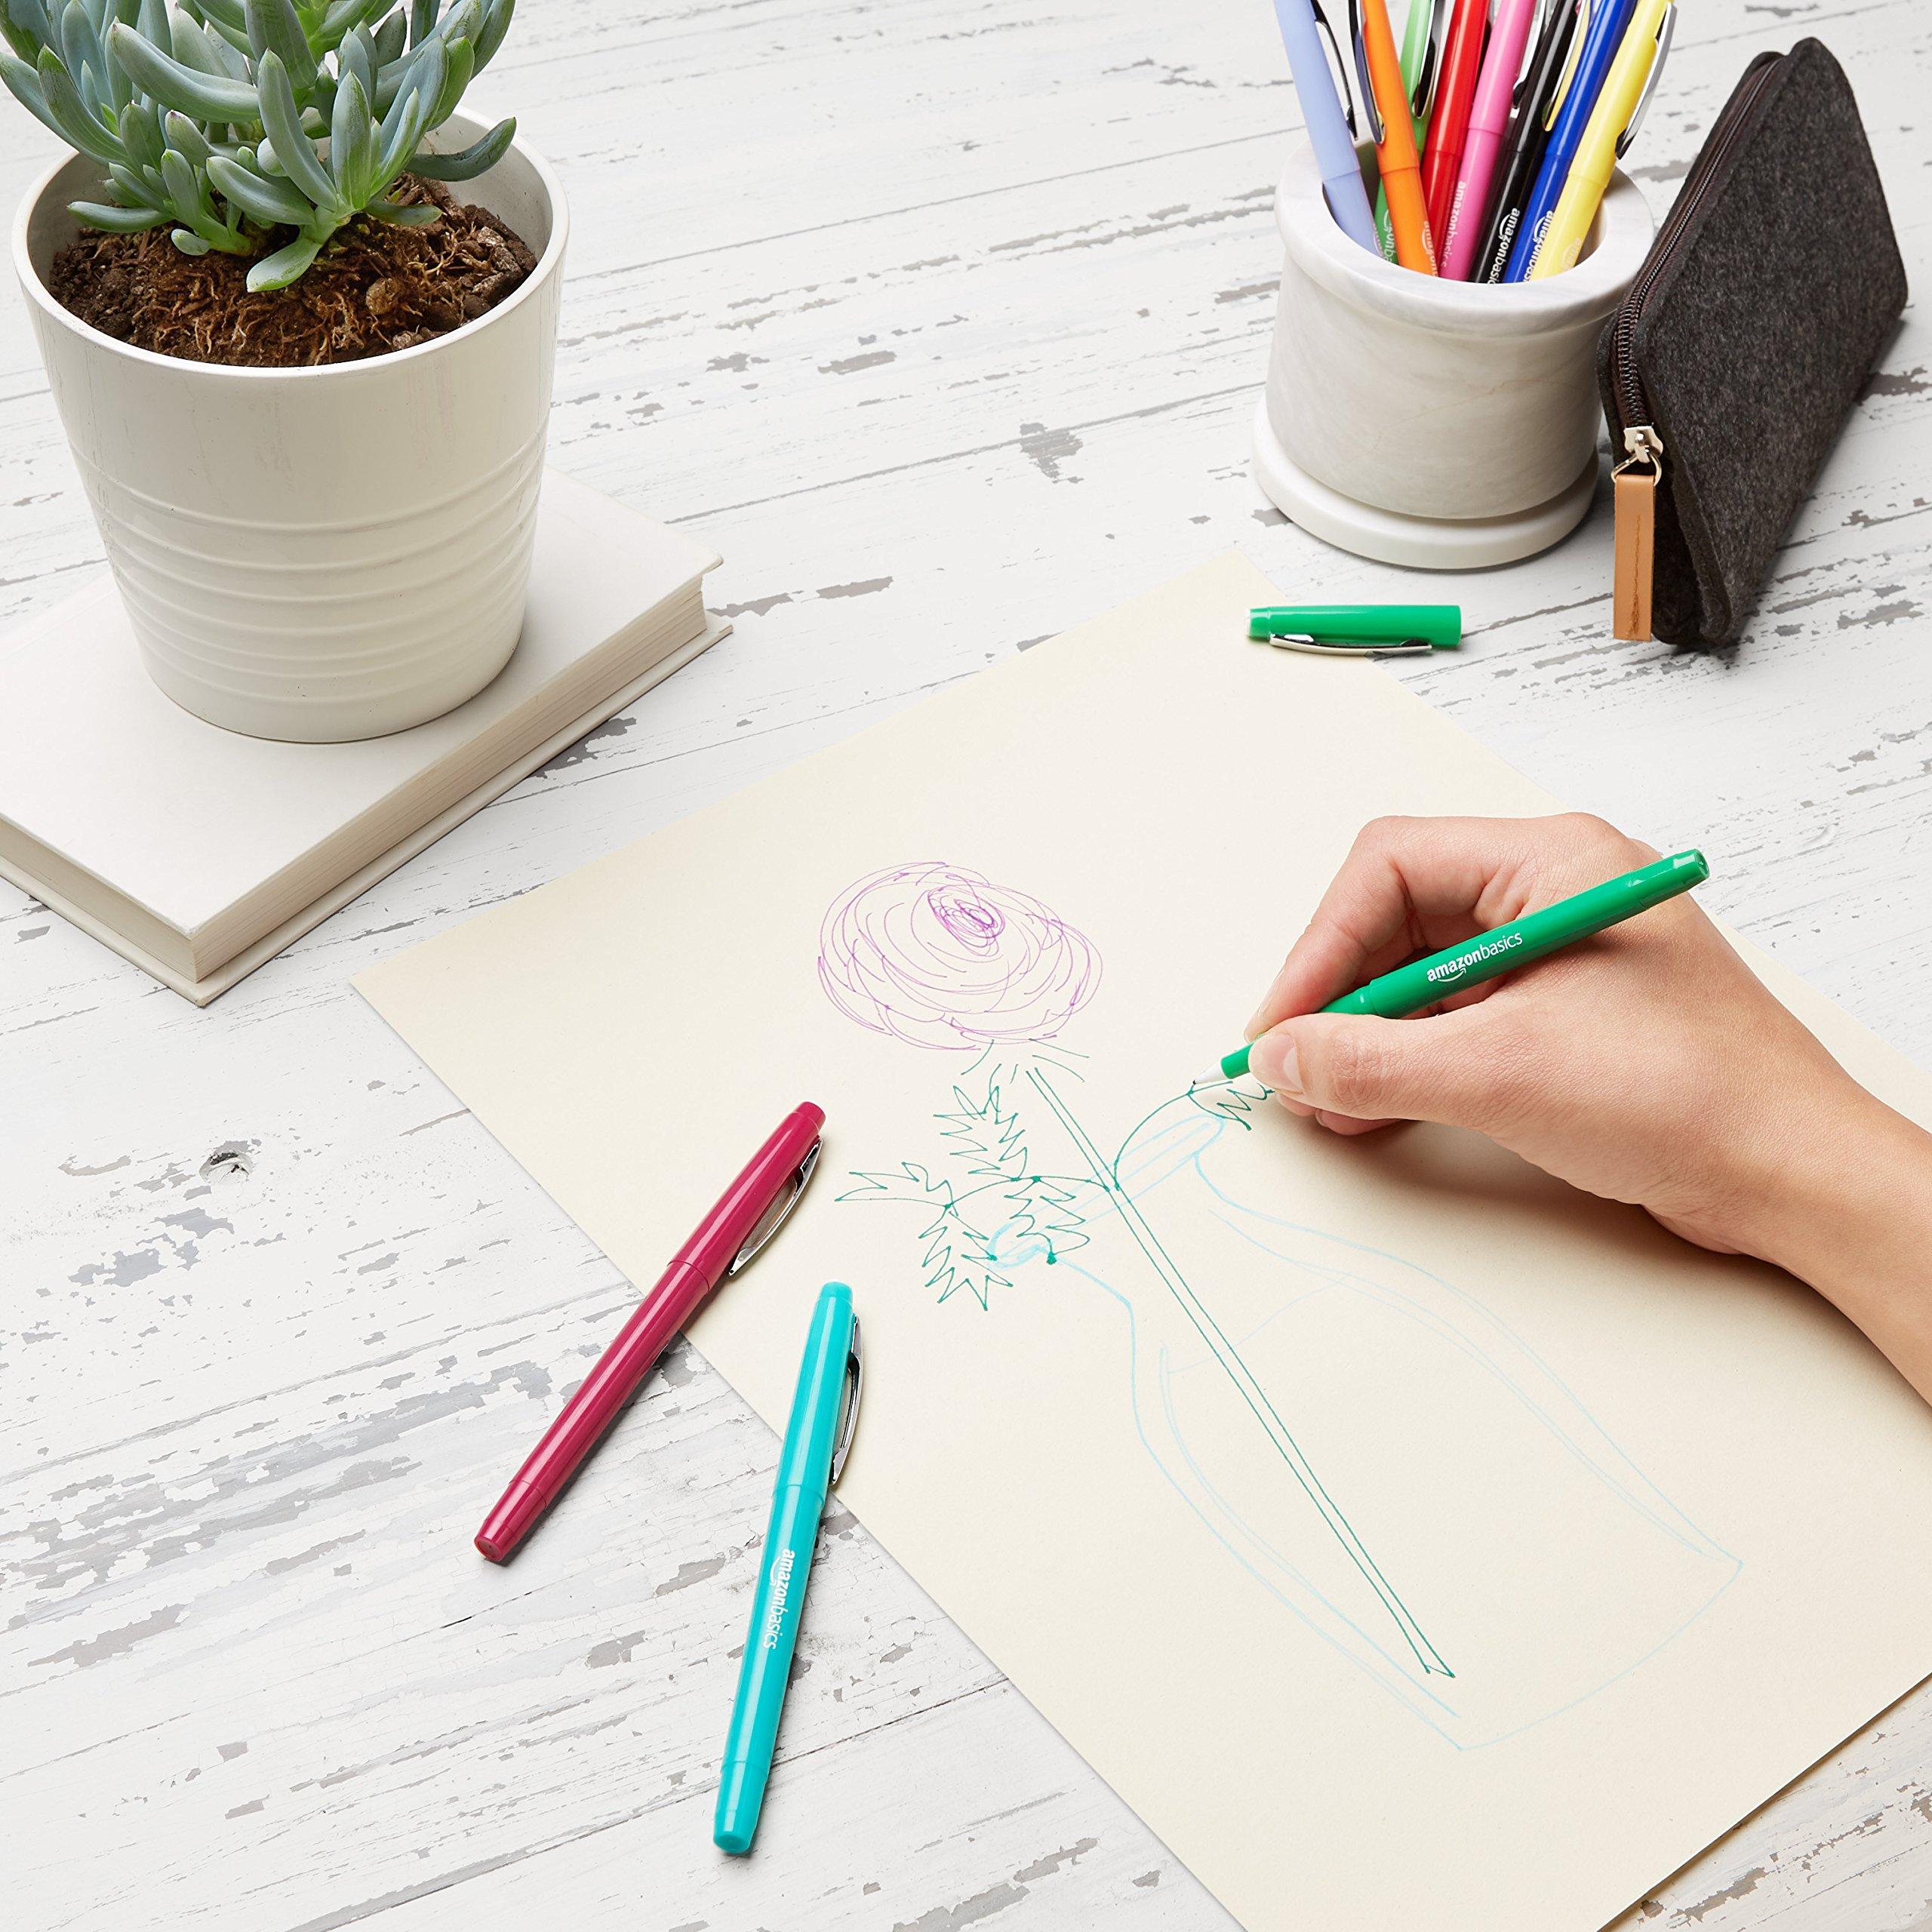 AmazonBasics Felt Tip Marker Pens - Assorted Color, 24-Pack by AmazonBasics (Image #3)